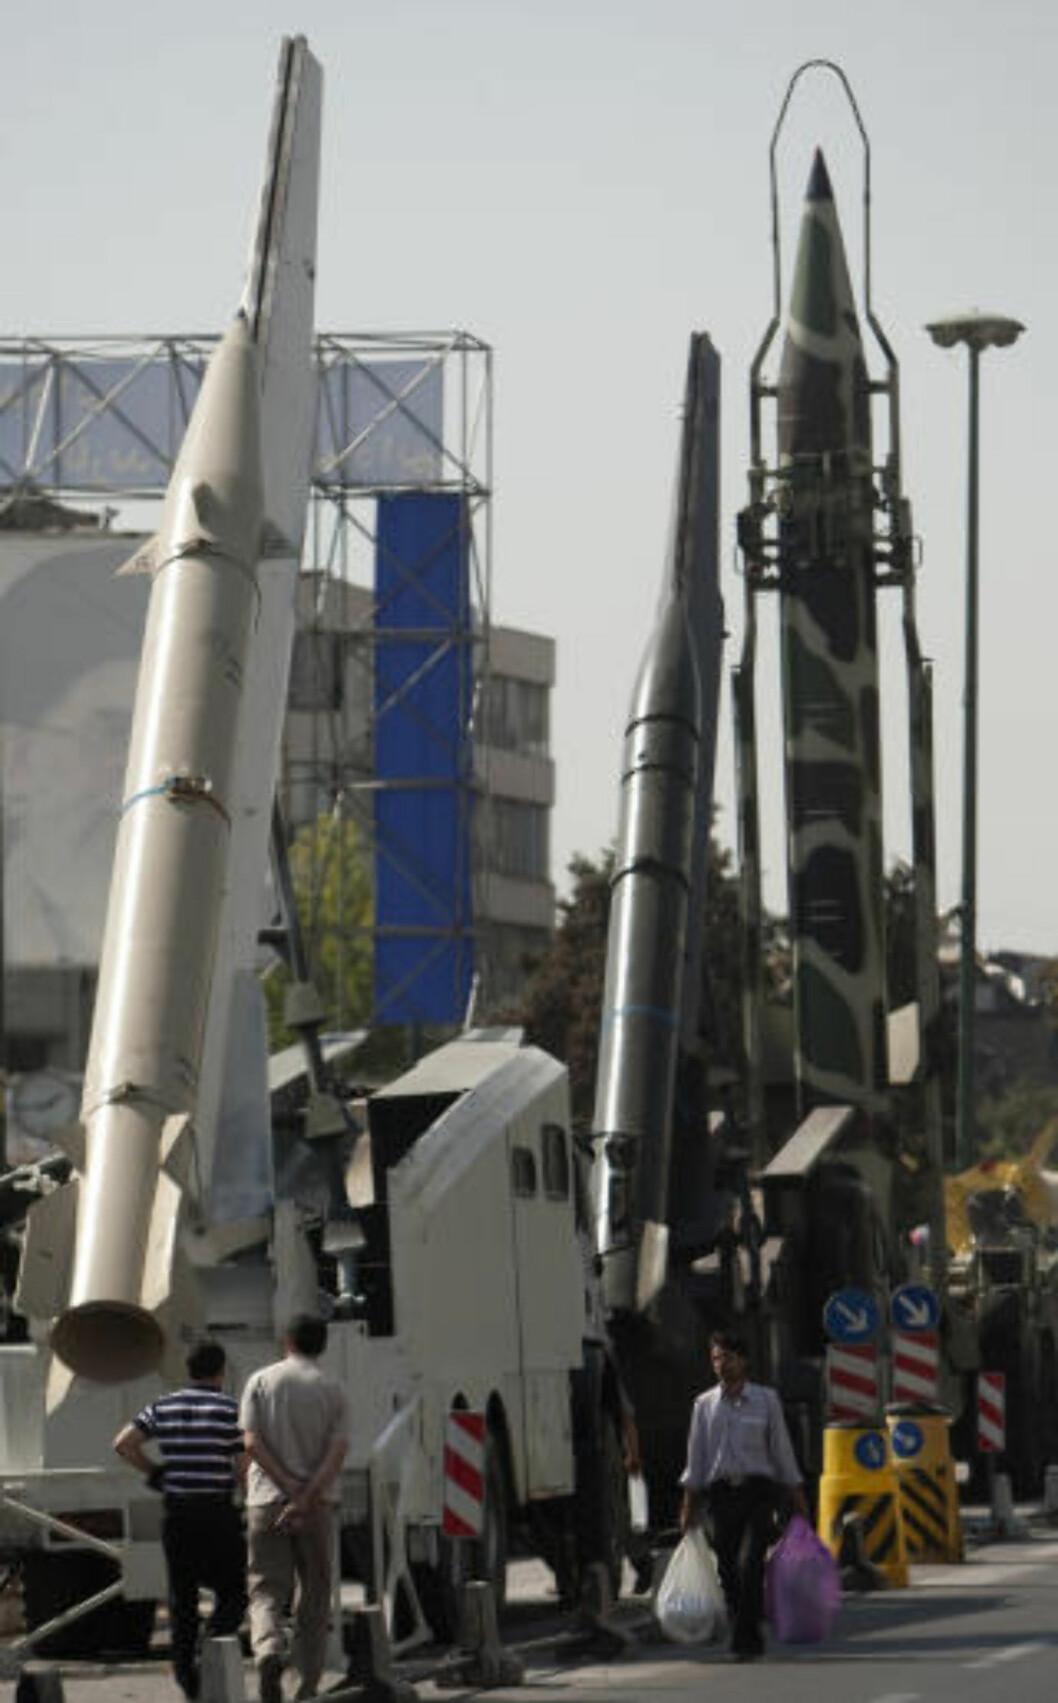 <strong>FRYKT:</strong> Israel frykter at Iran skal utvikle atomvåpen. Her fra en iransk militærparade. Foto: Reuters